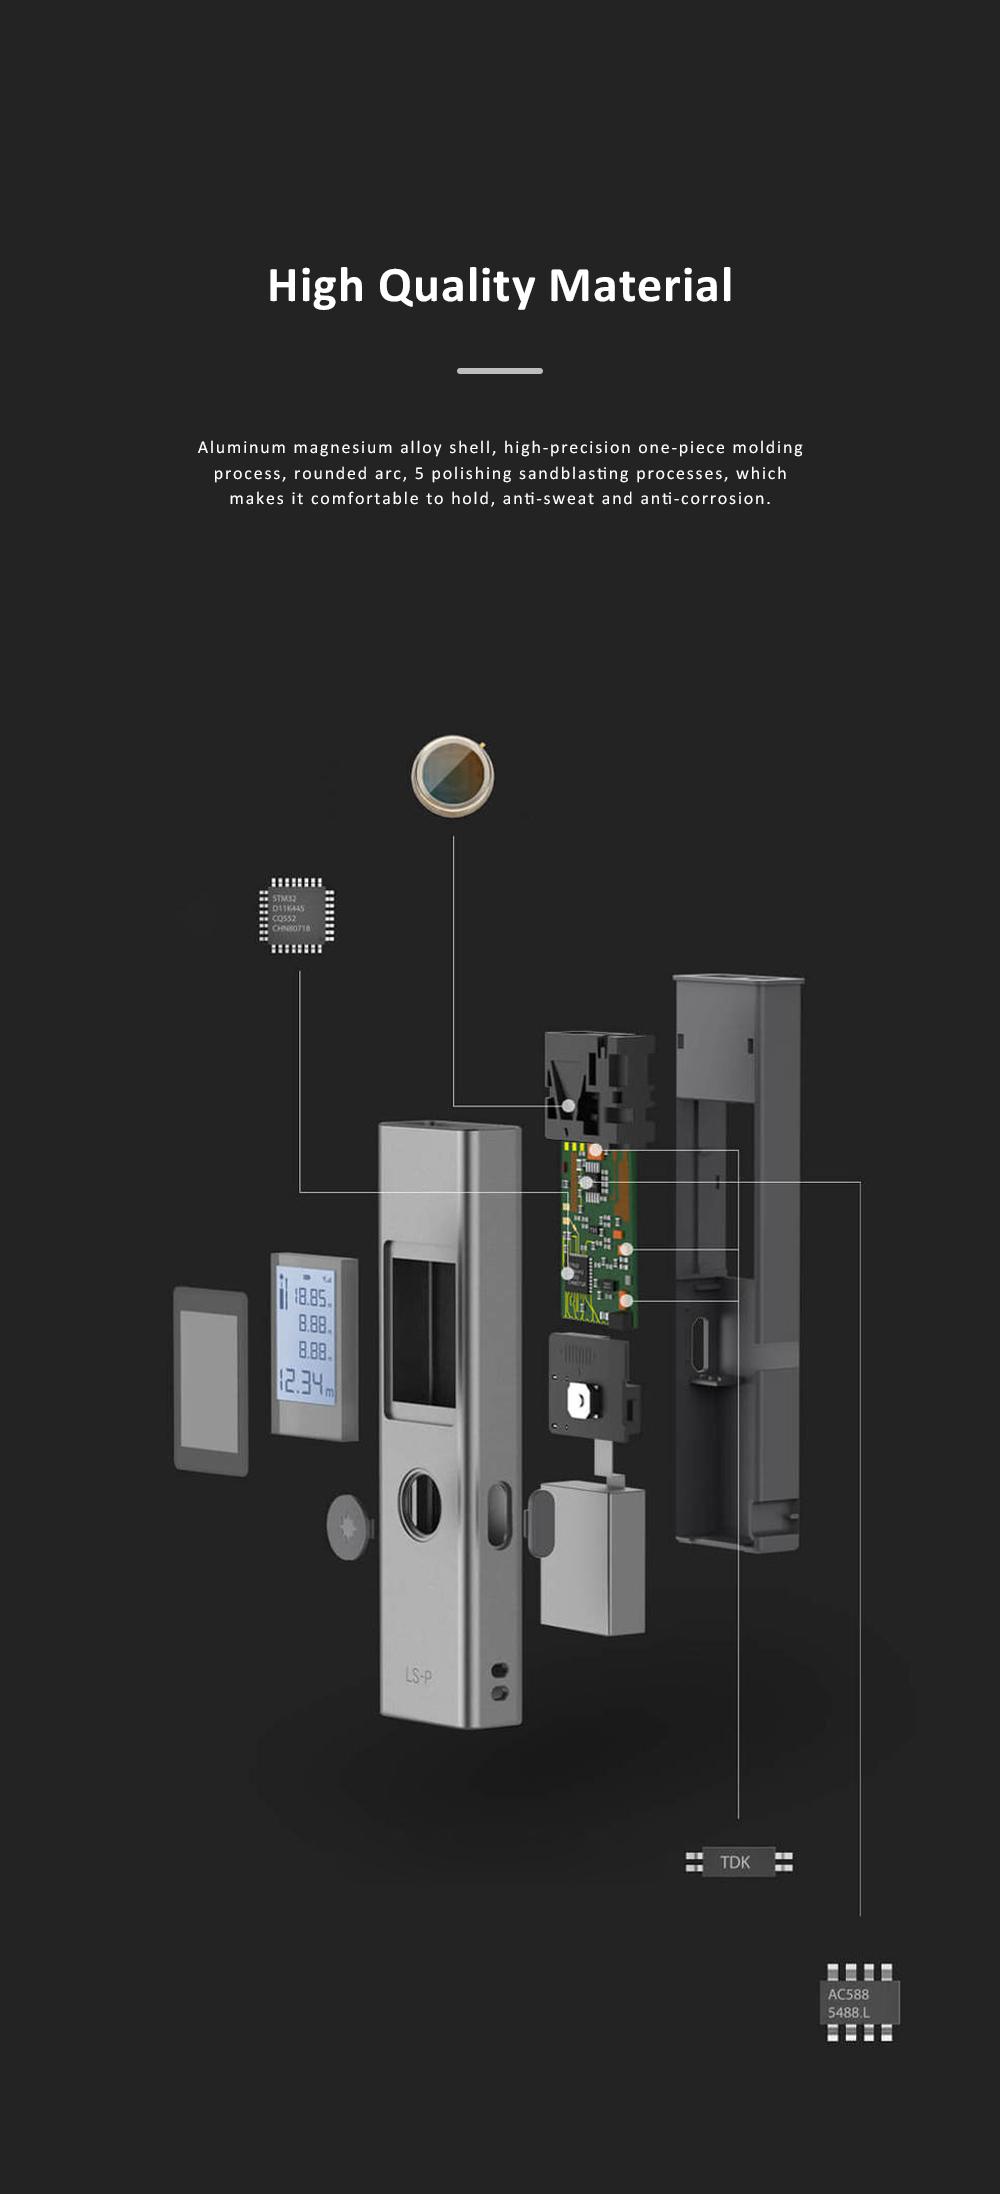 Xiaomi DUKA LS-P Laser Distance Rangefinder Mini Hand-held Digital Distance Meter with 200mAh Battery for Distance Area Volume Measurement 3